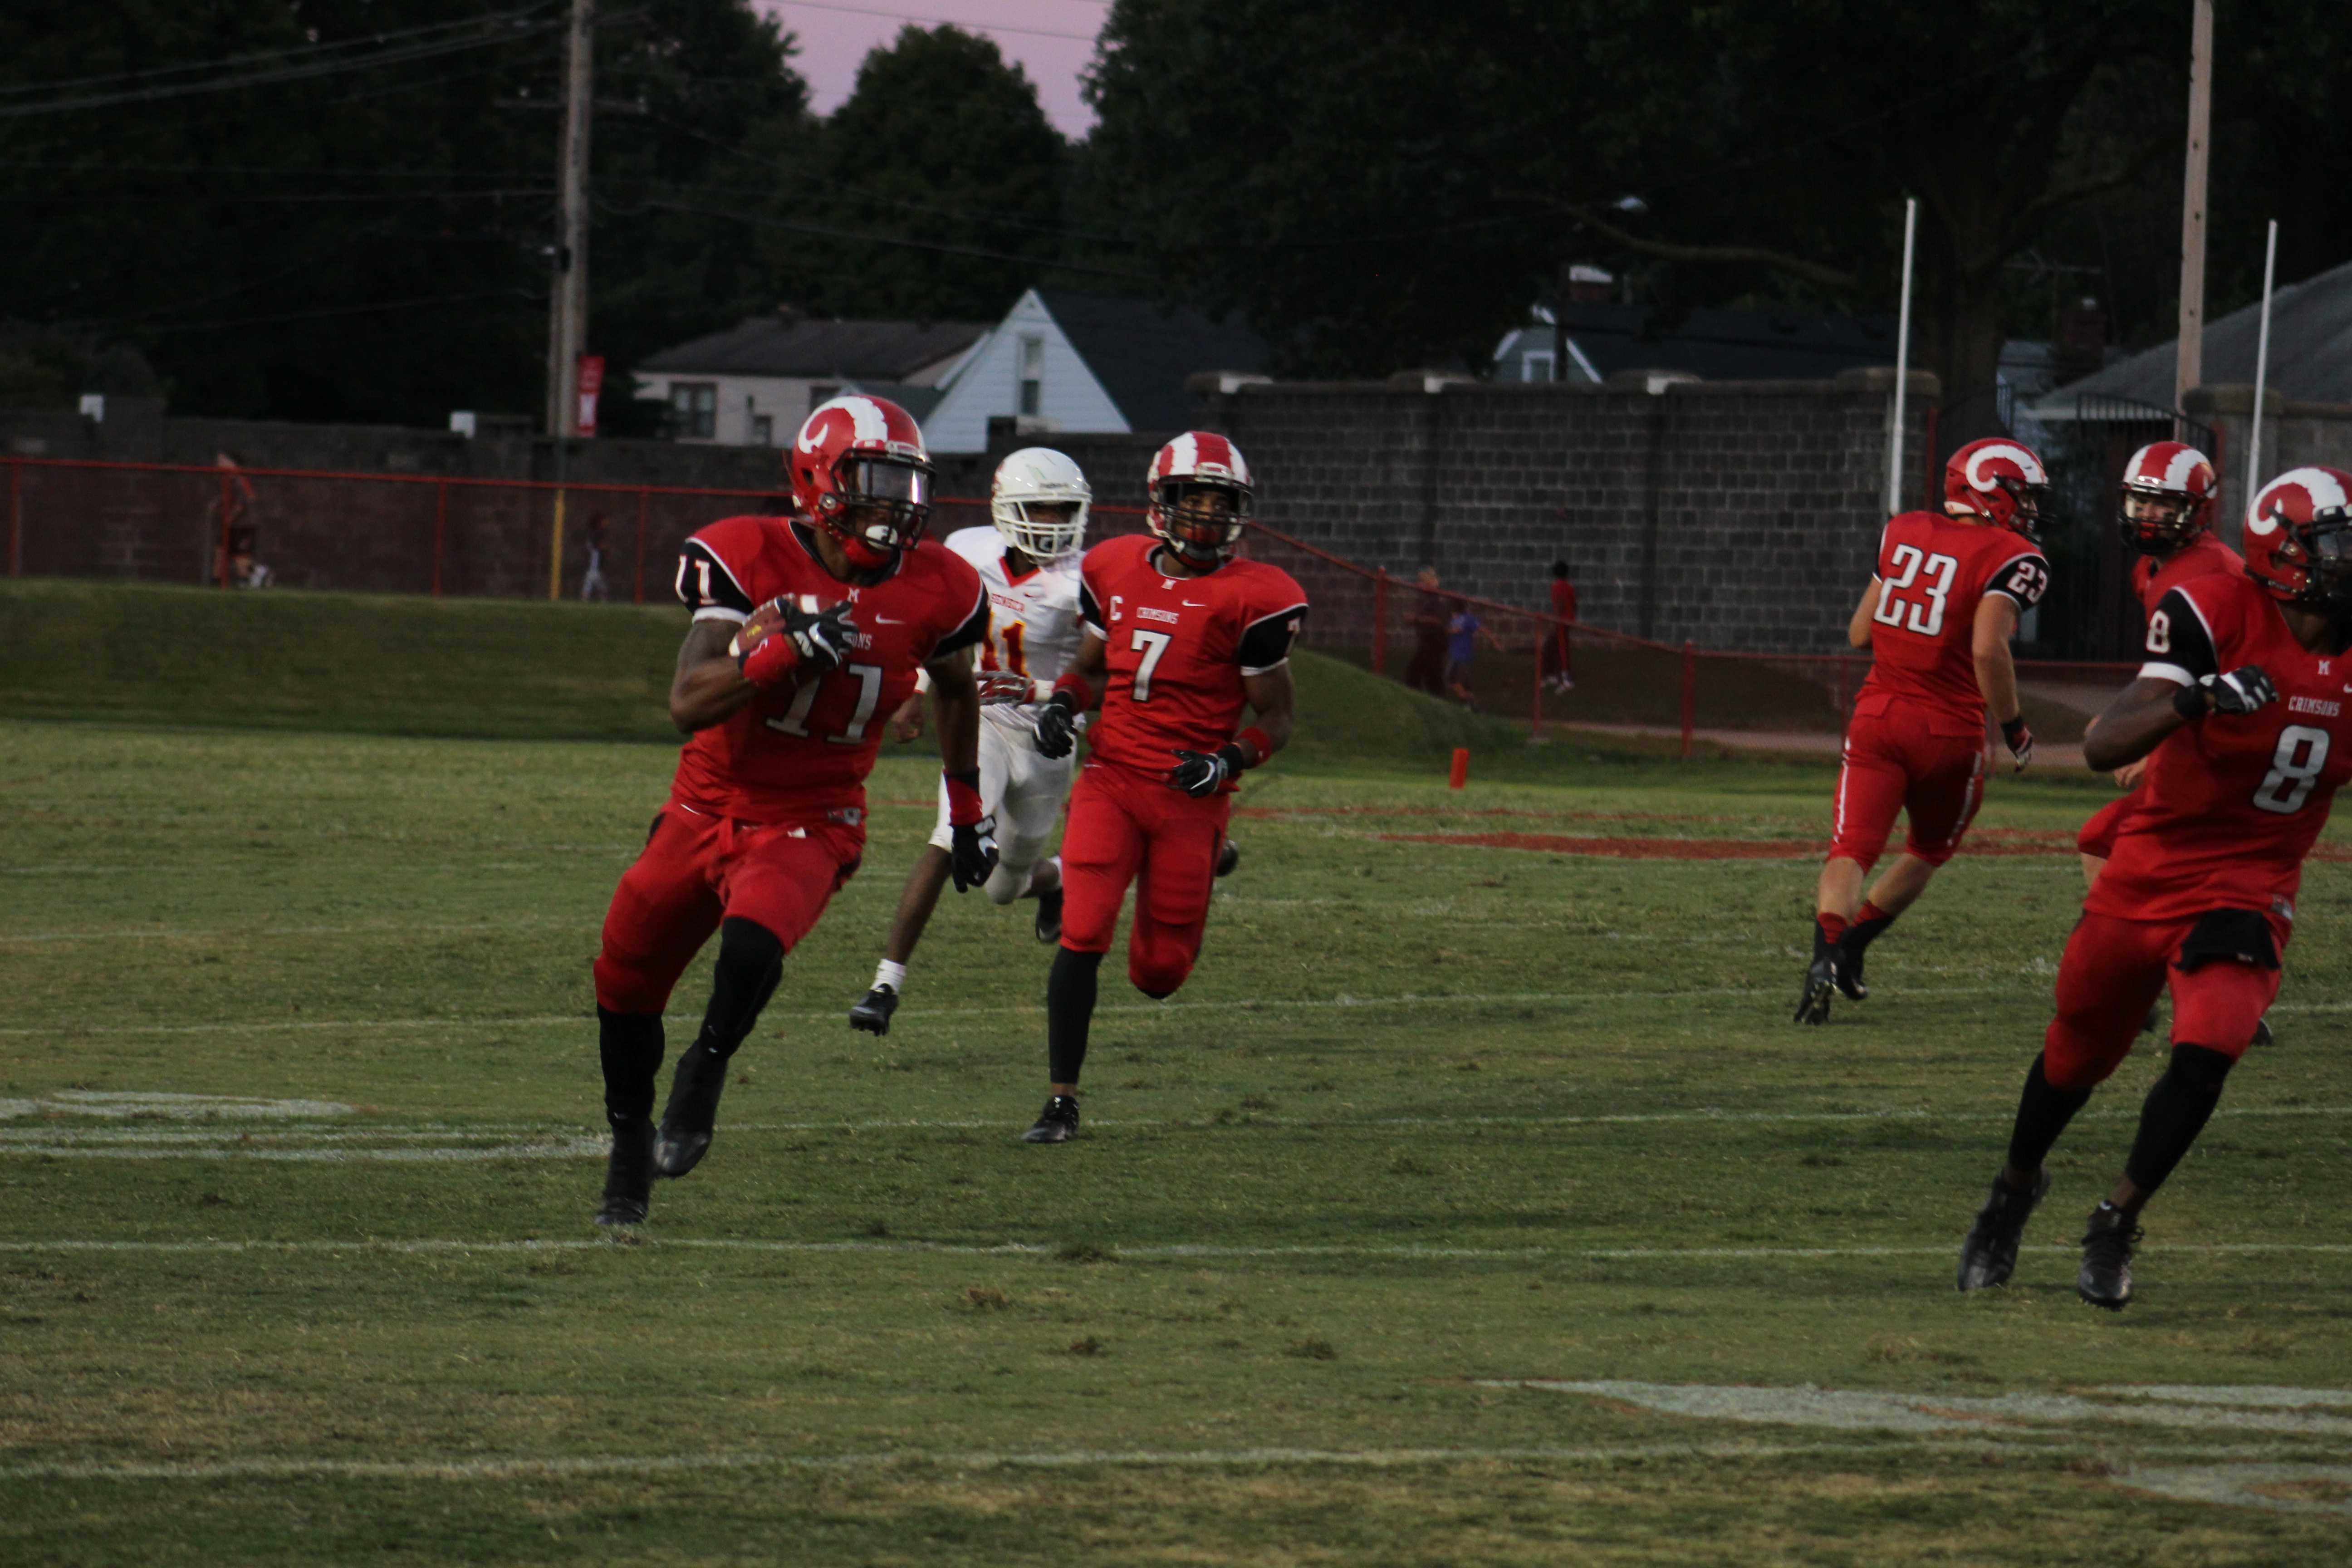 Jaelin Carter (11, 12) runs for a touchdown. Photo by Emma Bornschein.